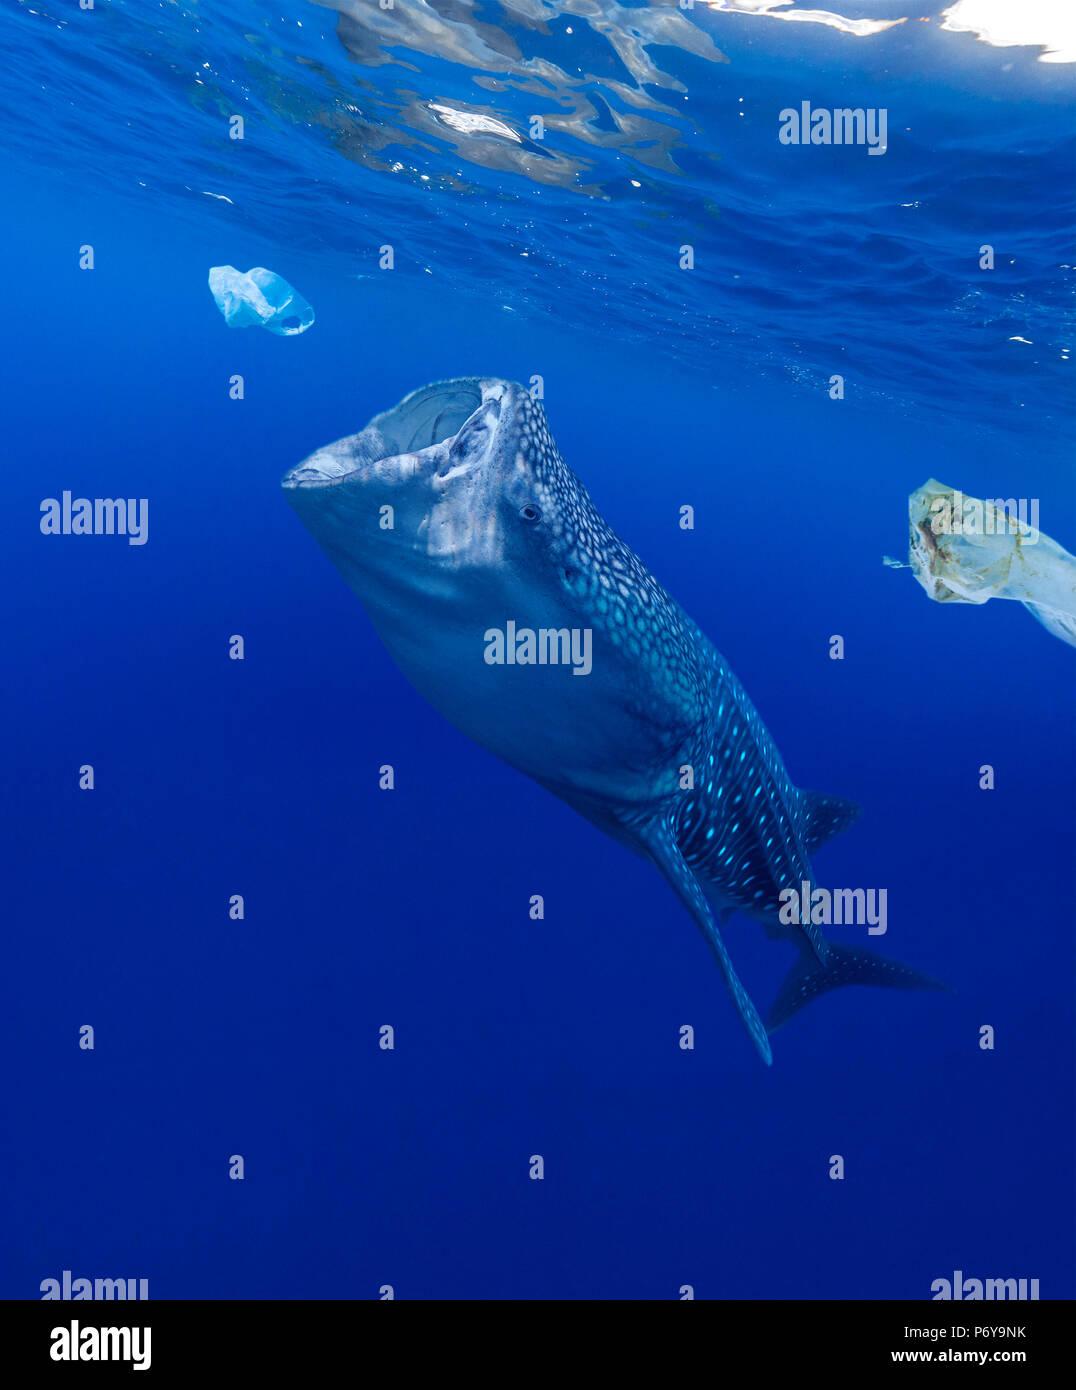 Whale shark, Rhincodon typus, feeding near plastic bags. - Stock Image